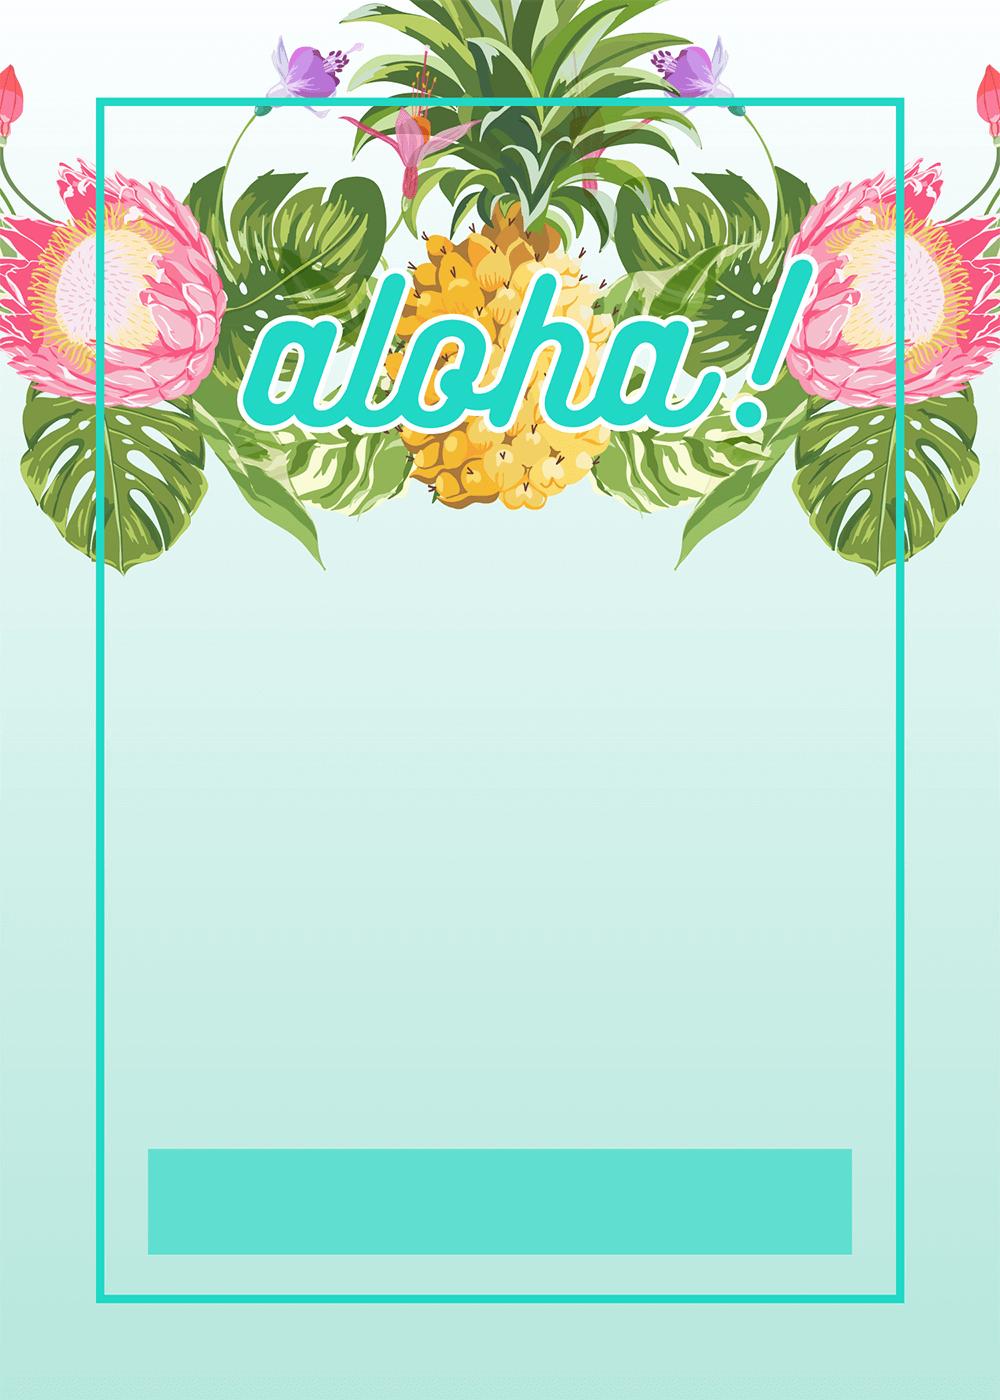 Pineapple Luau Perimeter - Free Printable Birthday Invitation - Free Printable Luau Baby Shower Invitations